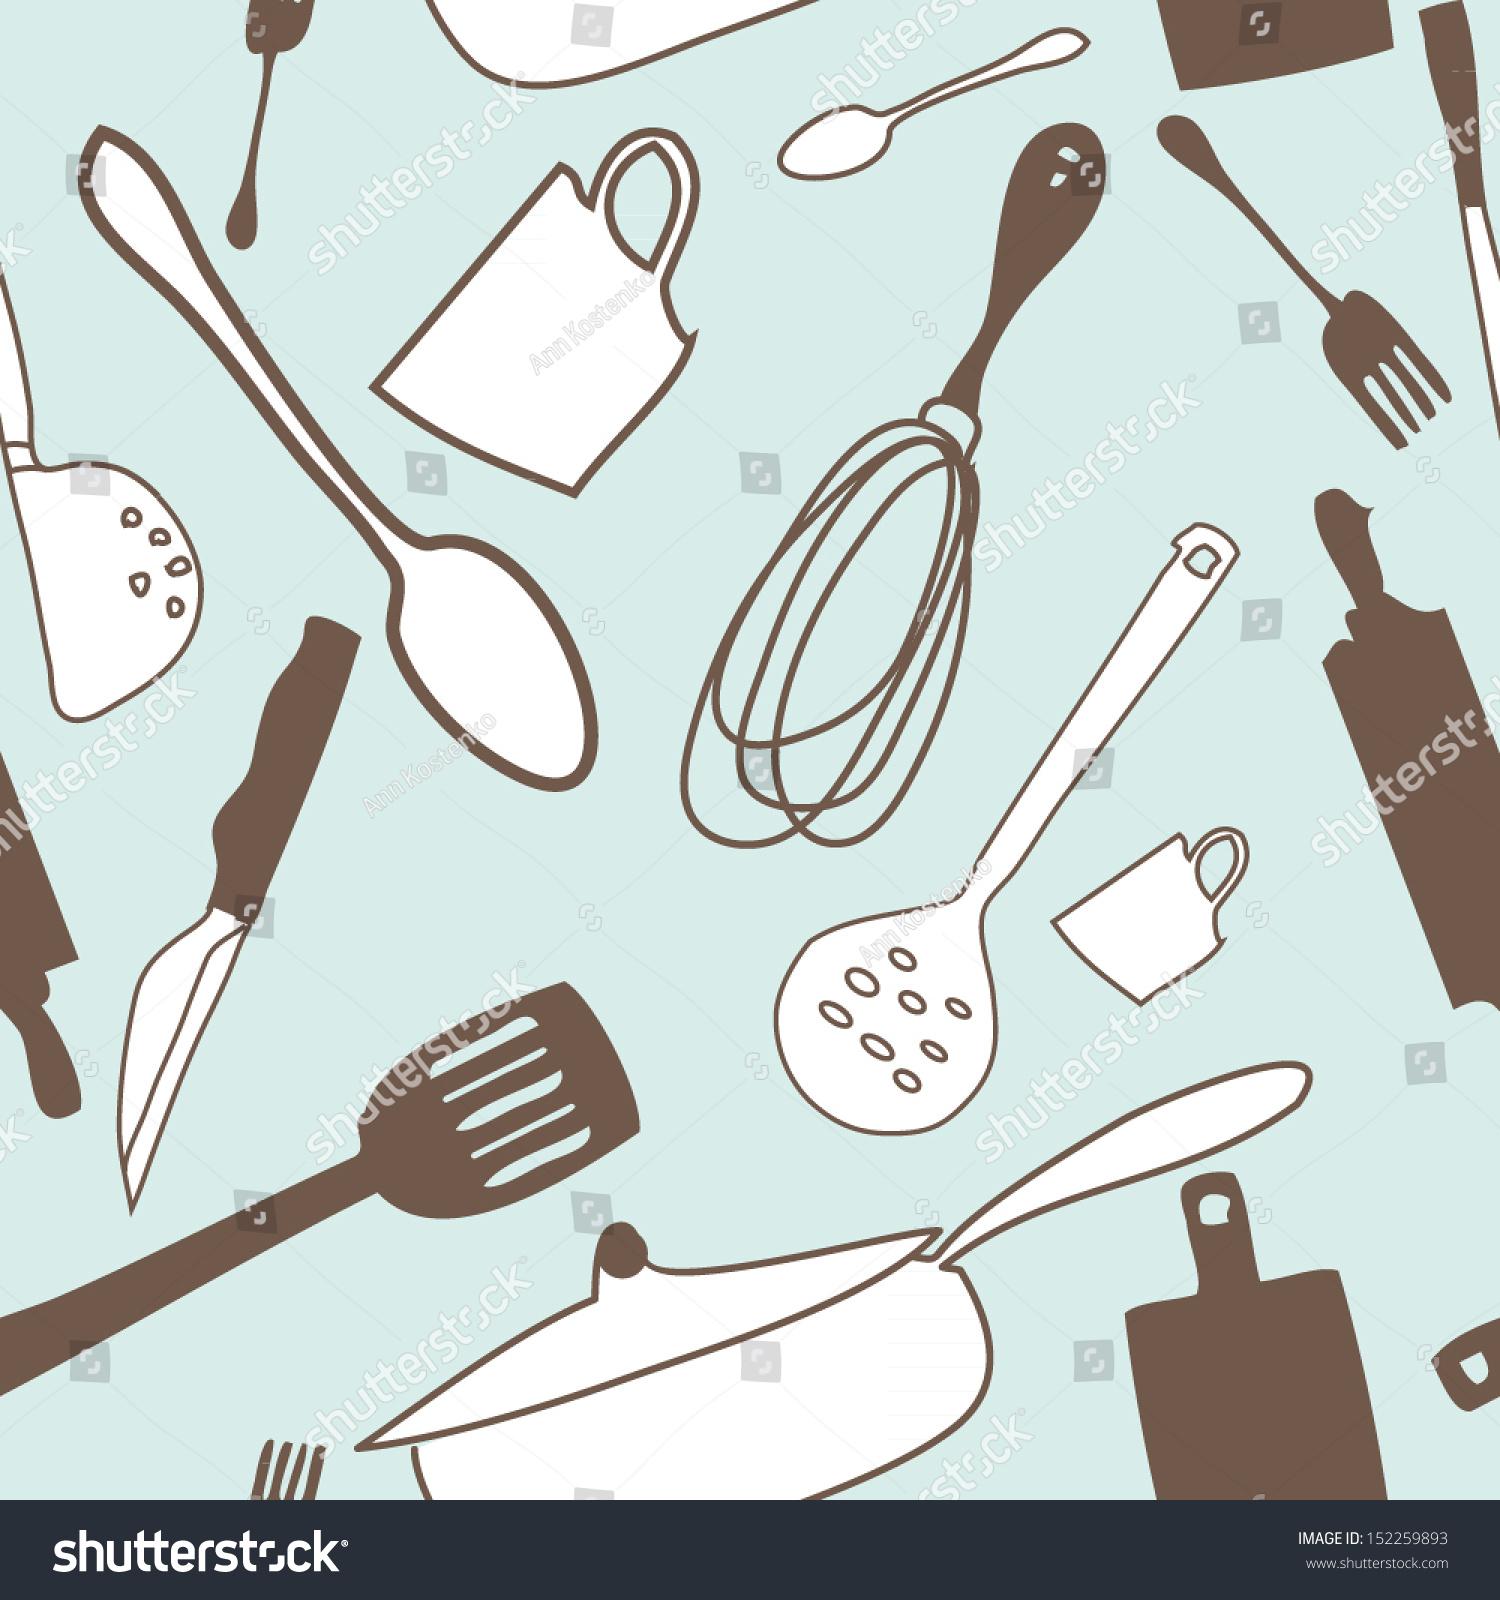 Best 59 Cook Background on HipWallpaper AJ Cook Wallpaper 1500x1600